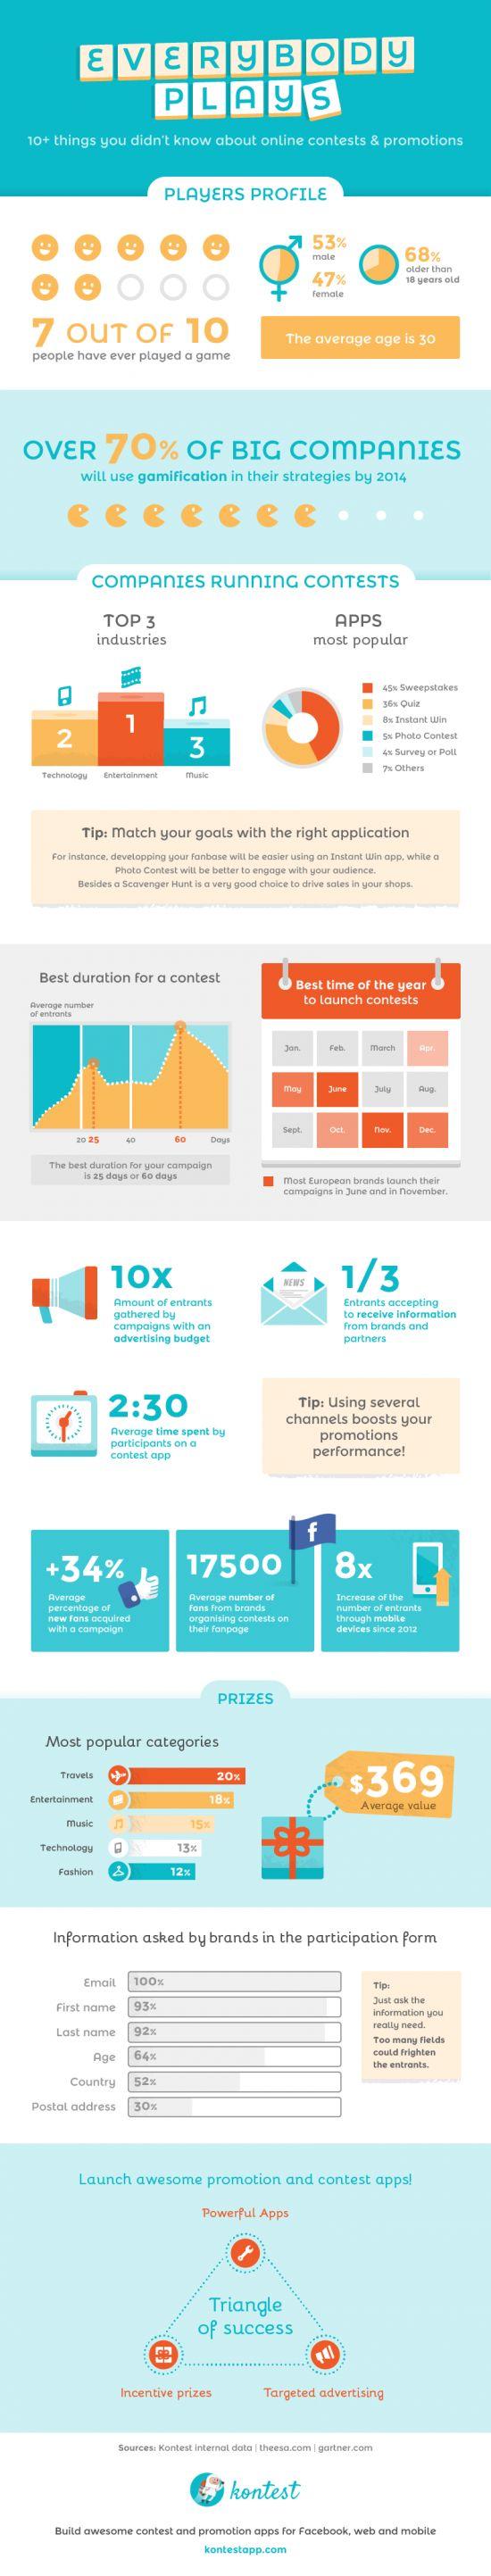 25 best DataViz images on Pinterest | Info graphics, Infographic and ...